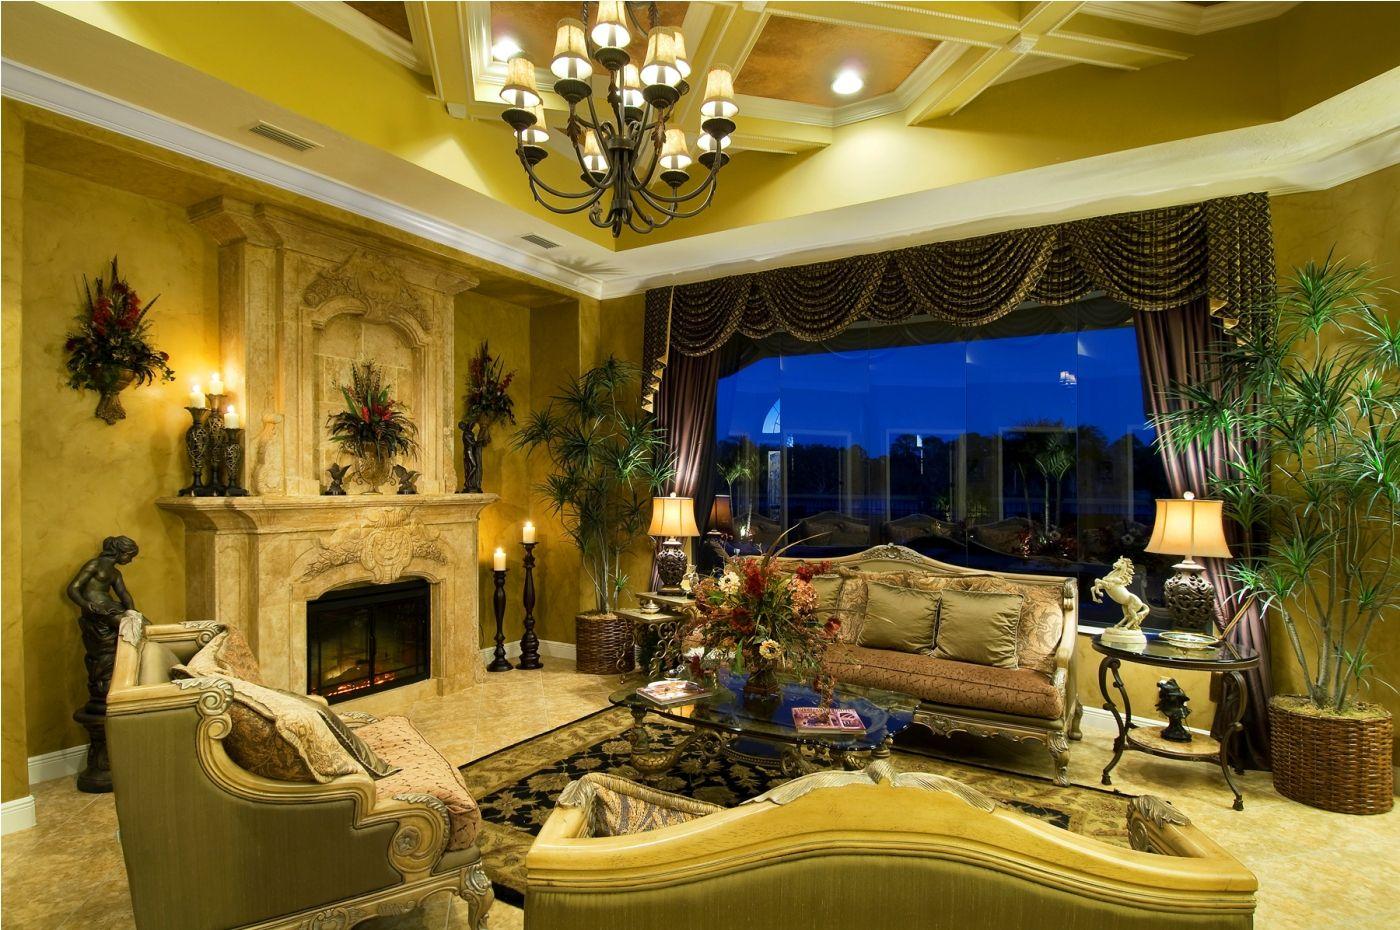 Decor Interior Decorator Chandelier Table Lamp Decorative Plants ...